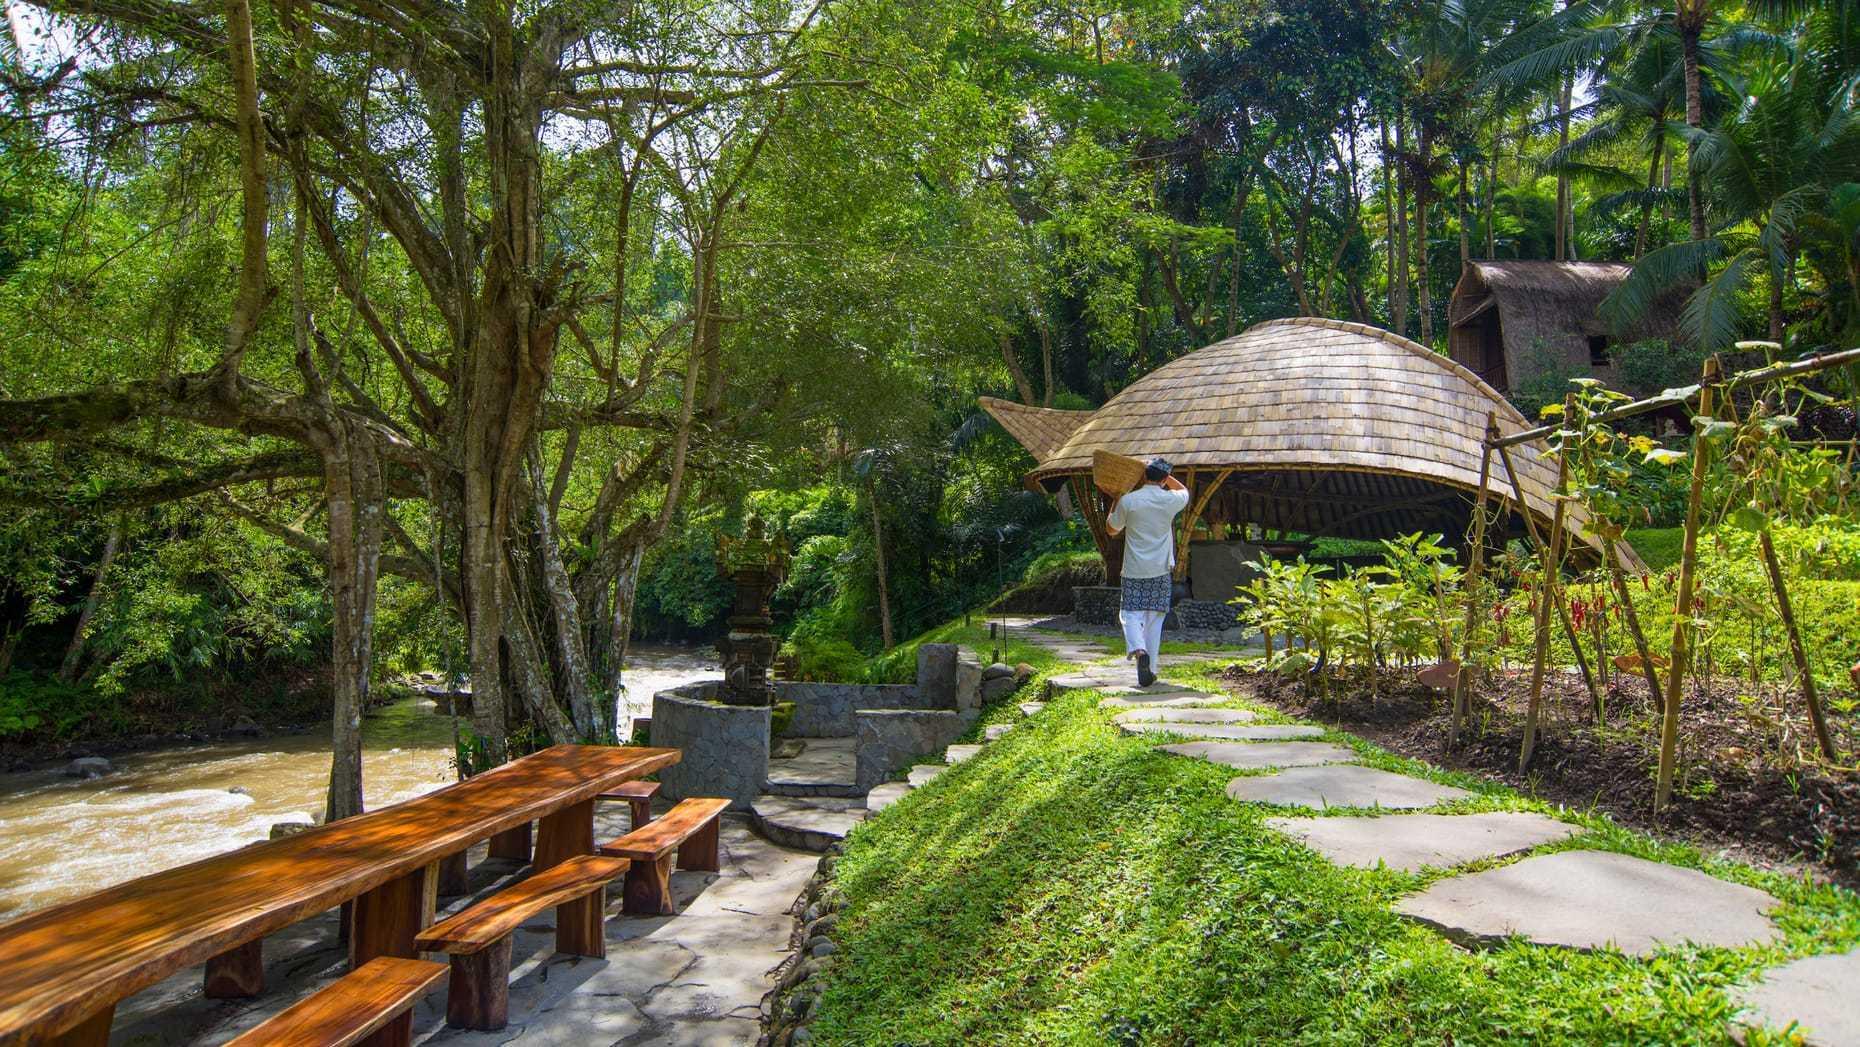 Agung Budi Raharsa | Architecture & Engineering Sokasi Bamboo Cooking Class / School - Bali Bali, Indonesia Bali, Indonesia Elevation  88744